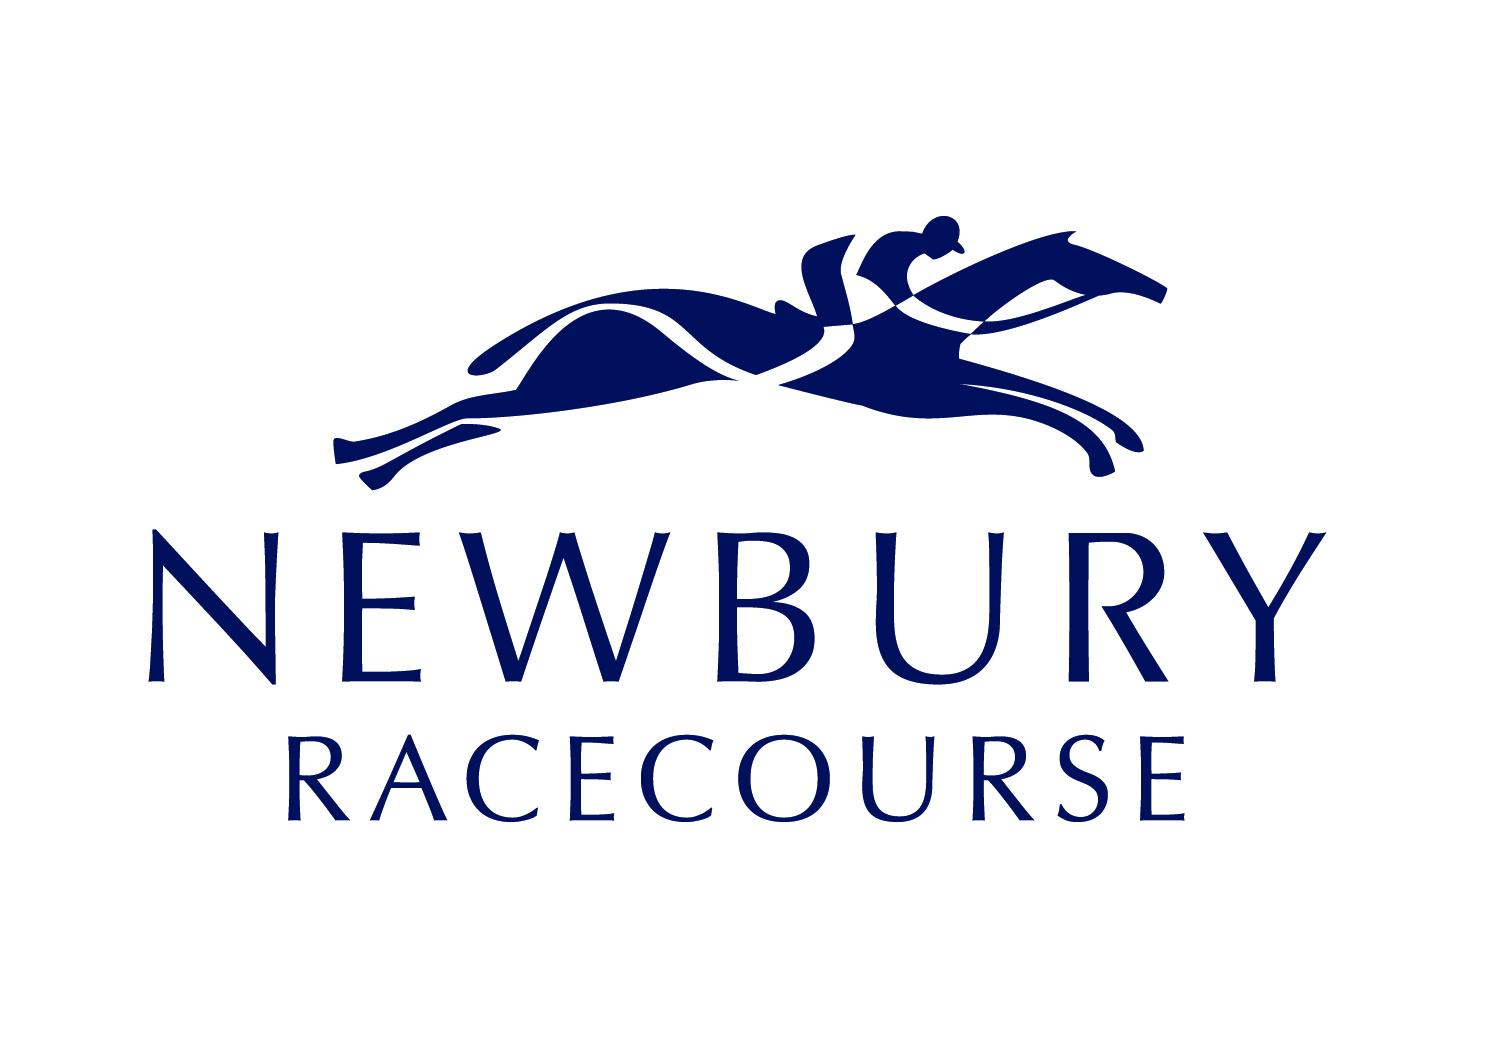 Newbury_racecourse_navy_white_spot 2767C